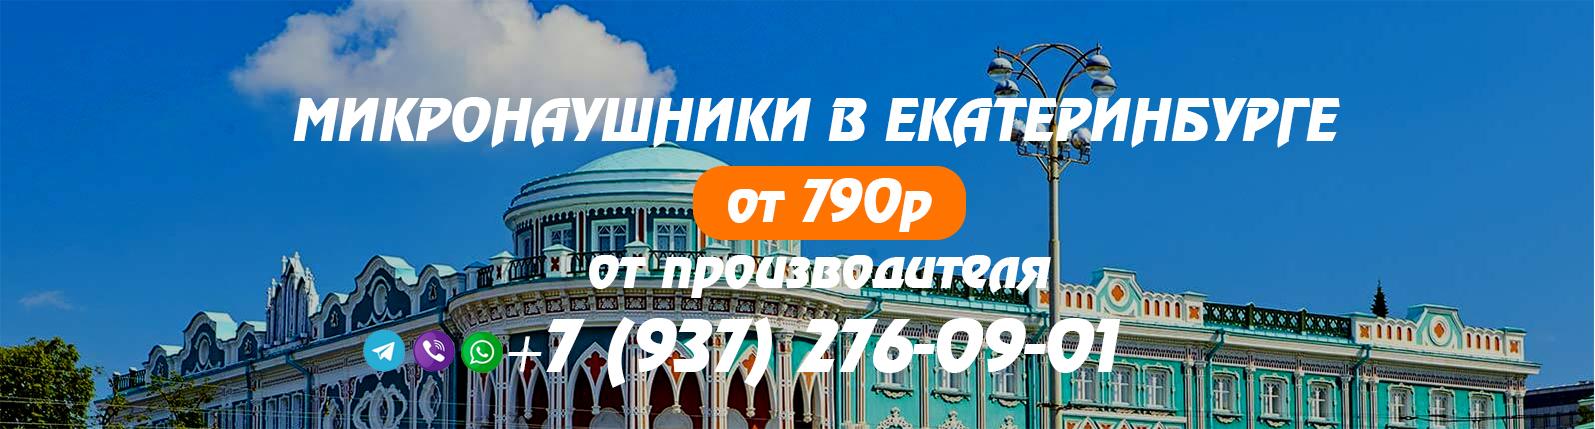 mikronaushniki-ekaterinburg